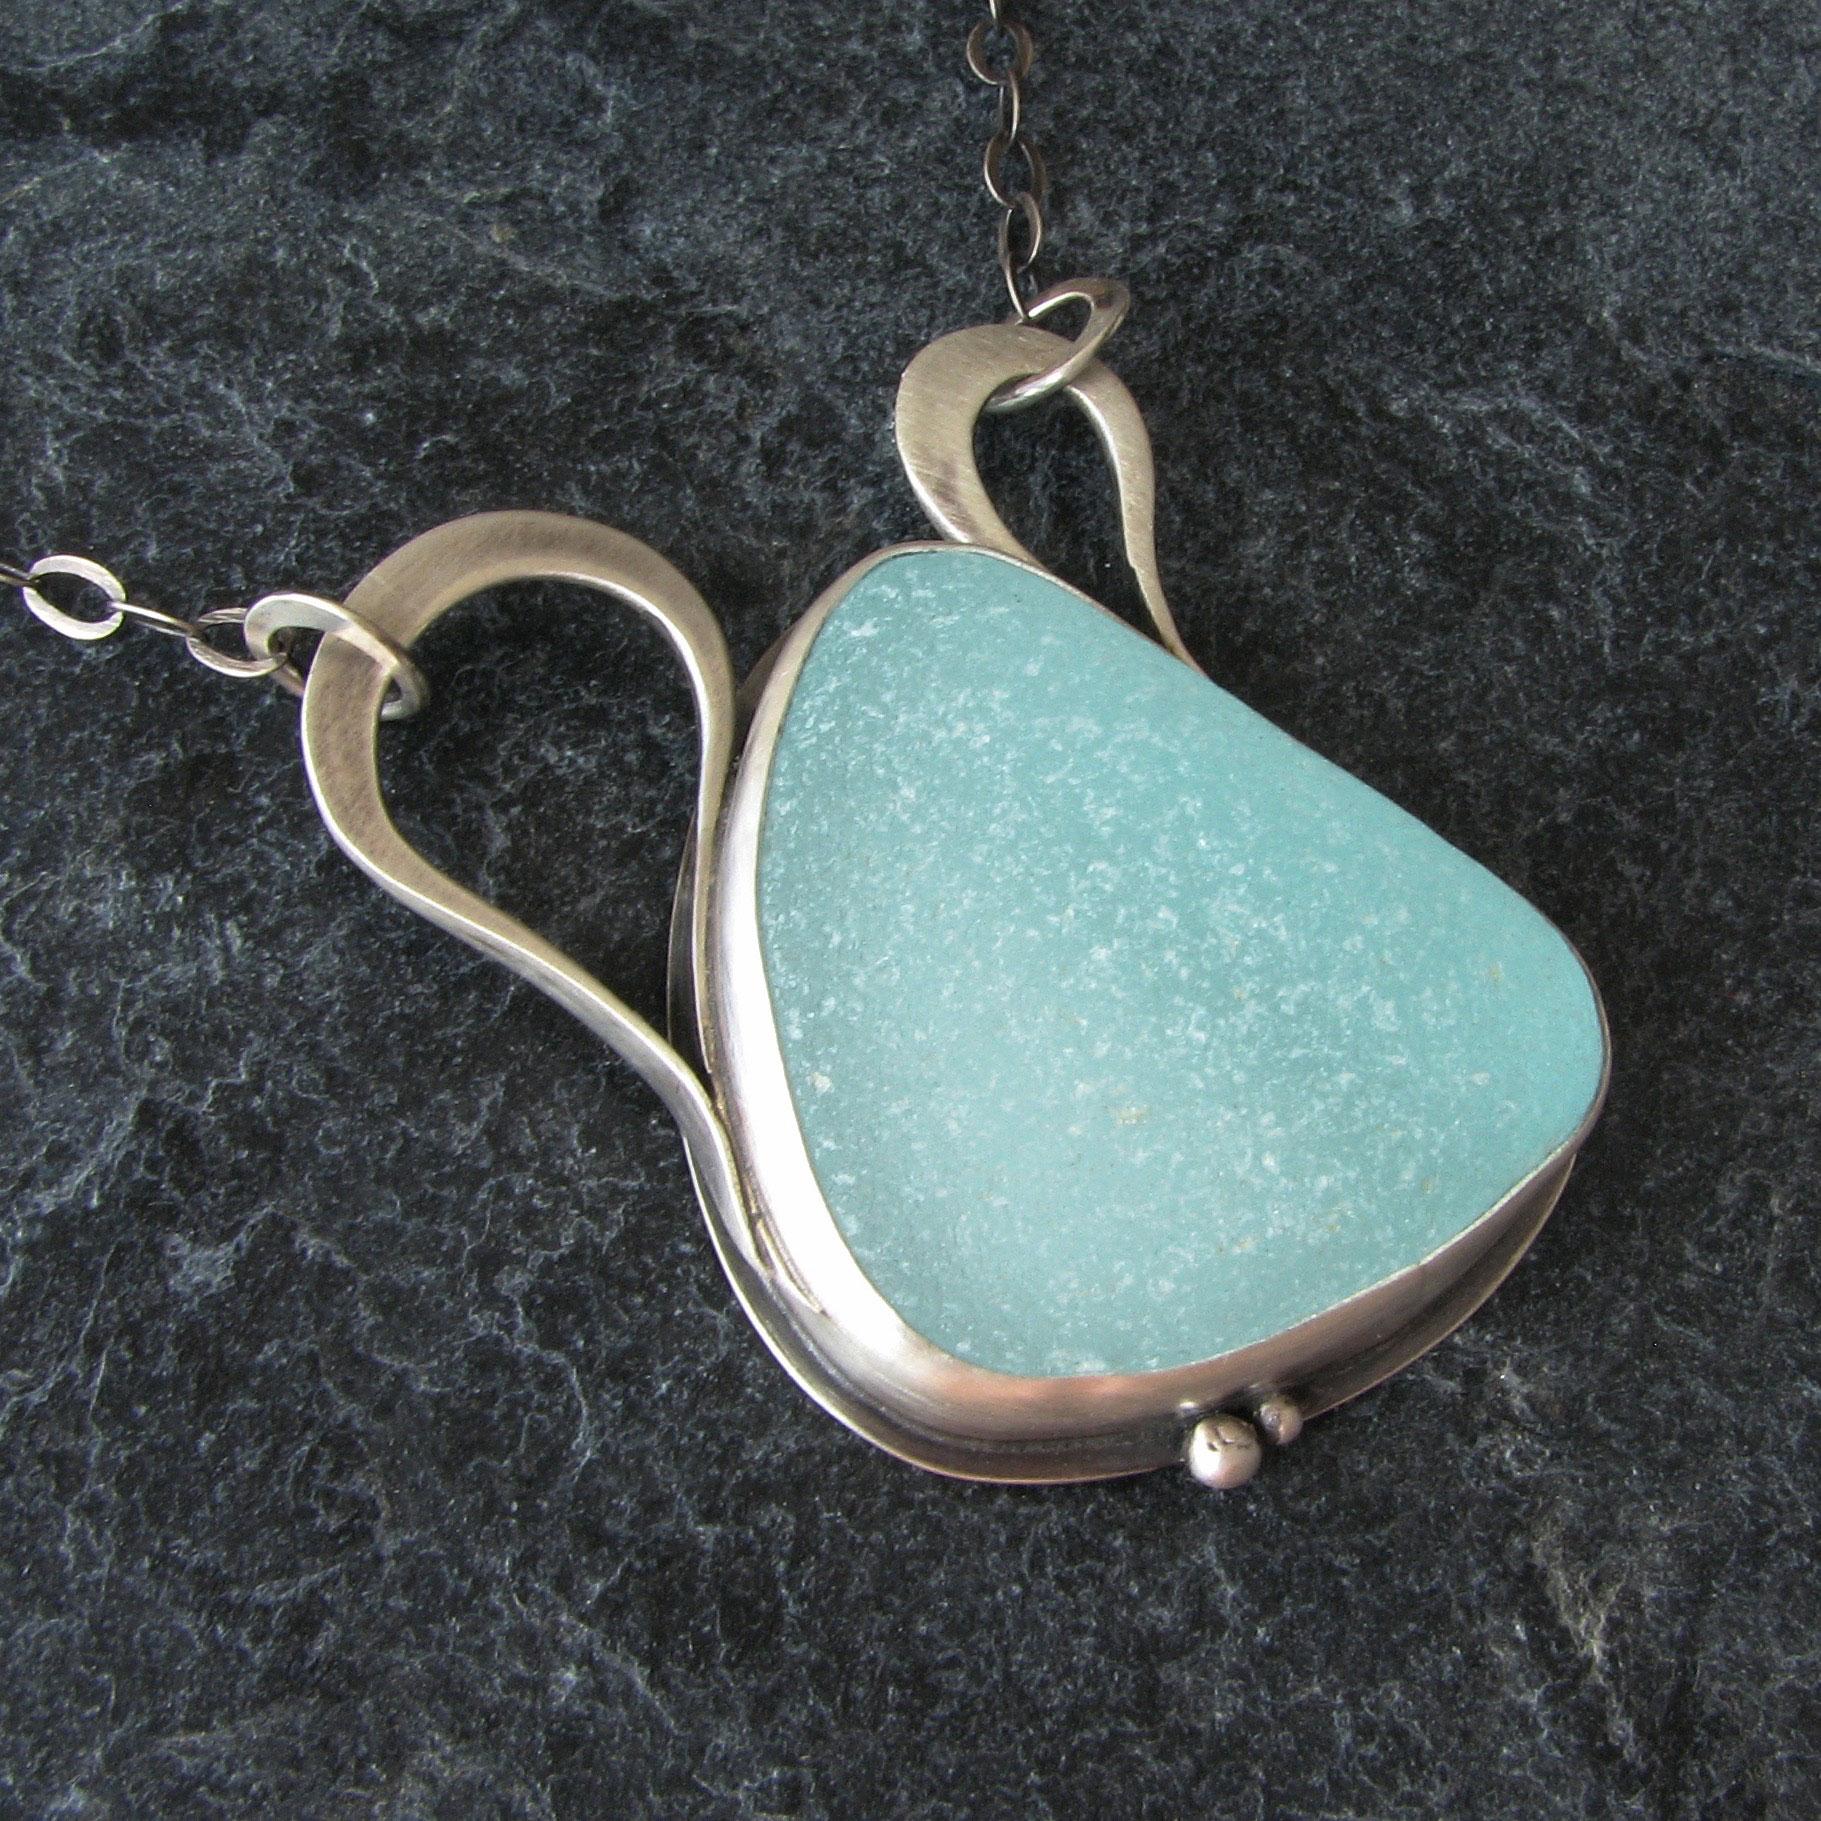 sea-glass-necklace-aqua-monica-branstrom-studio.jpg